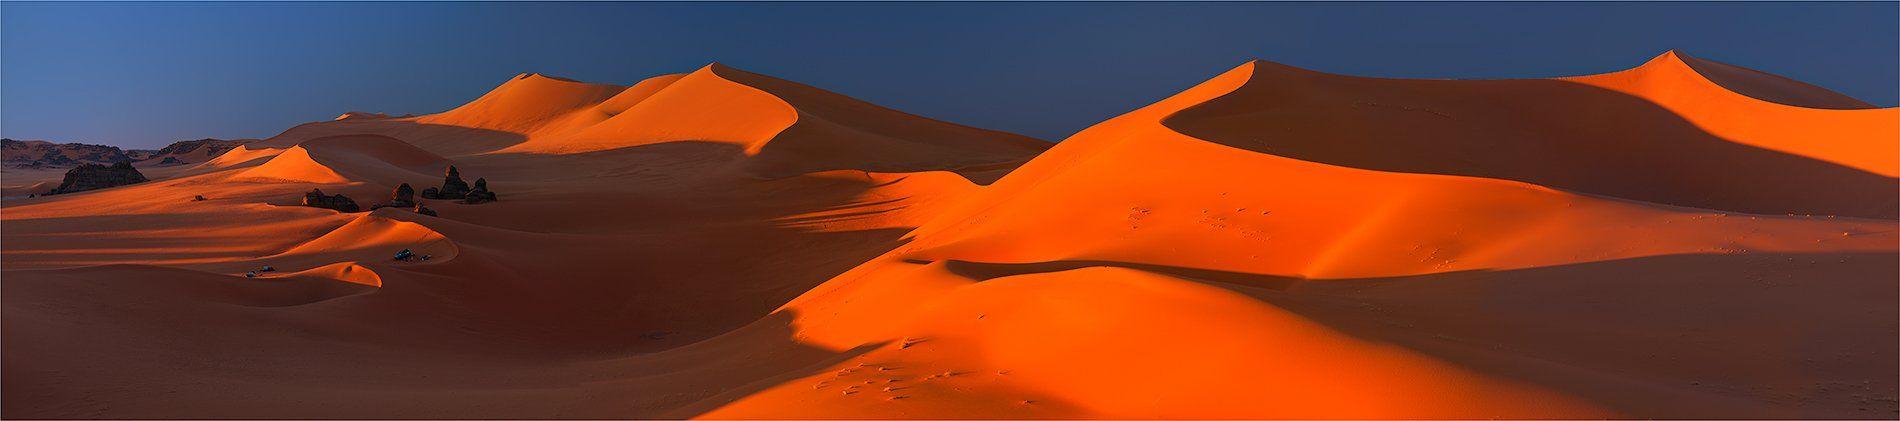 сахара, алжир, фототур, Yury Pustovoy (artphoto-tour.com)